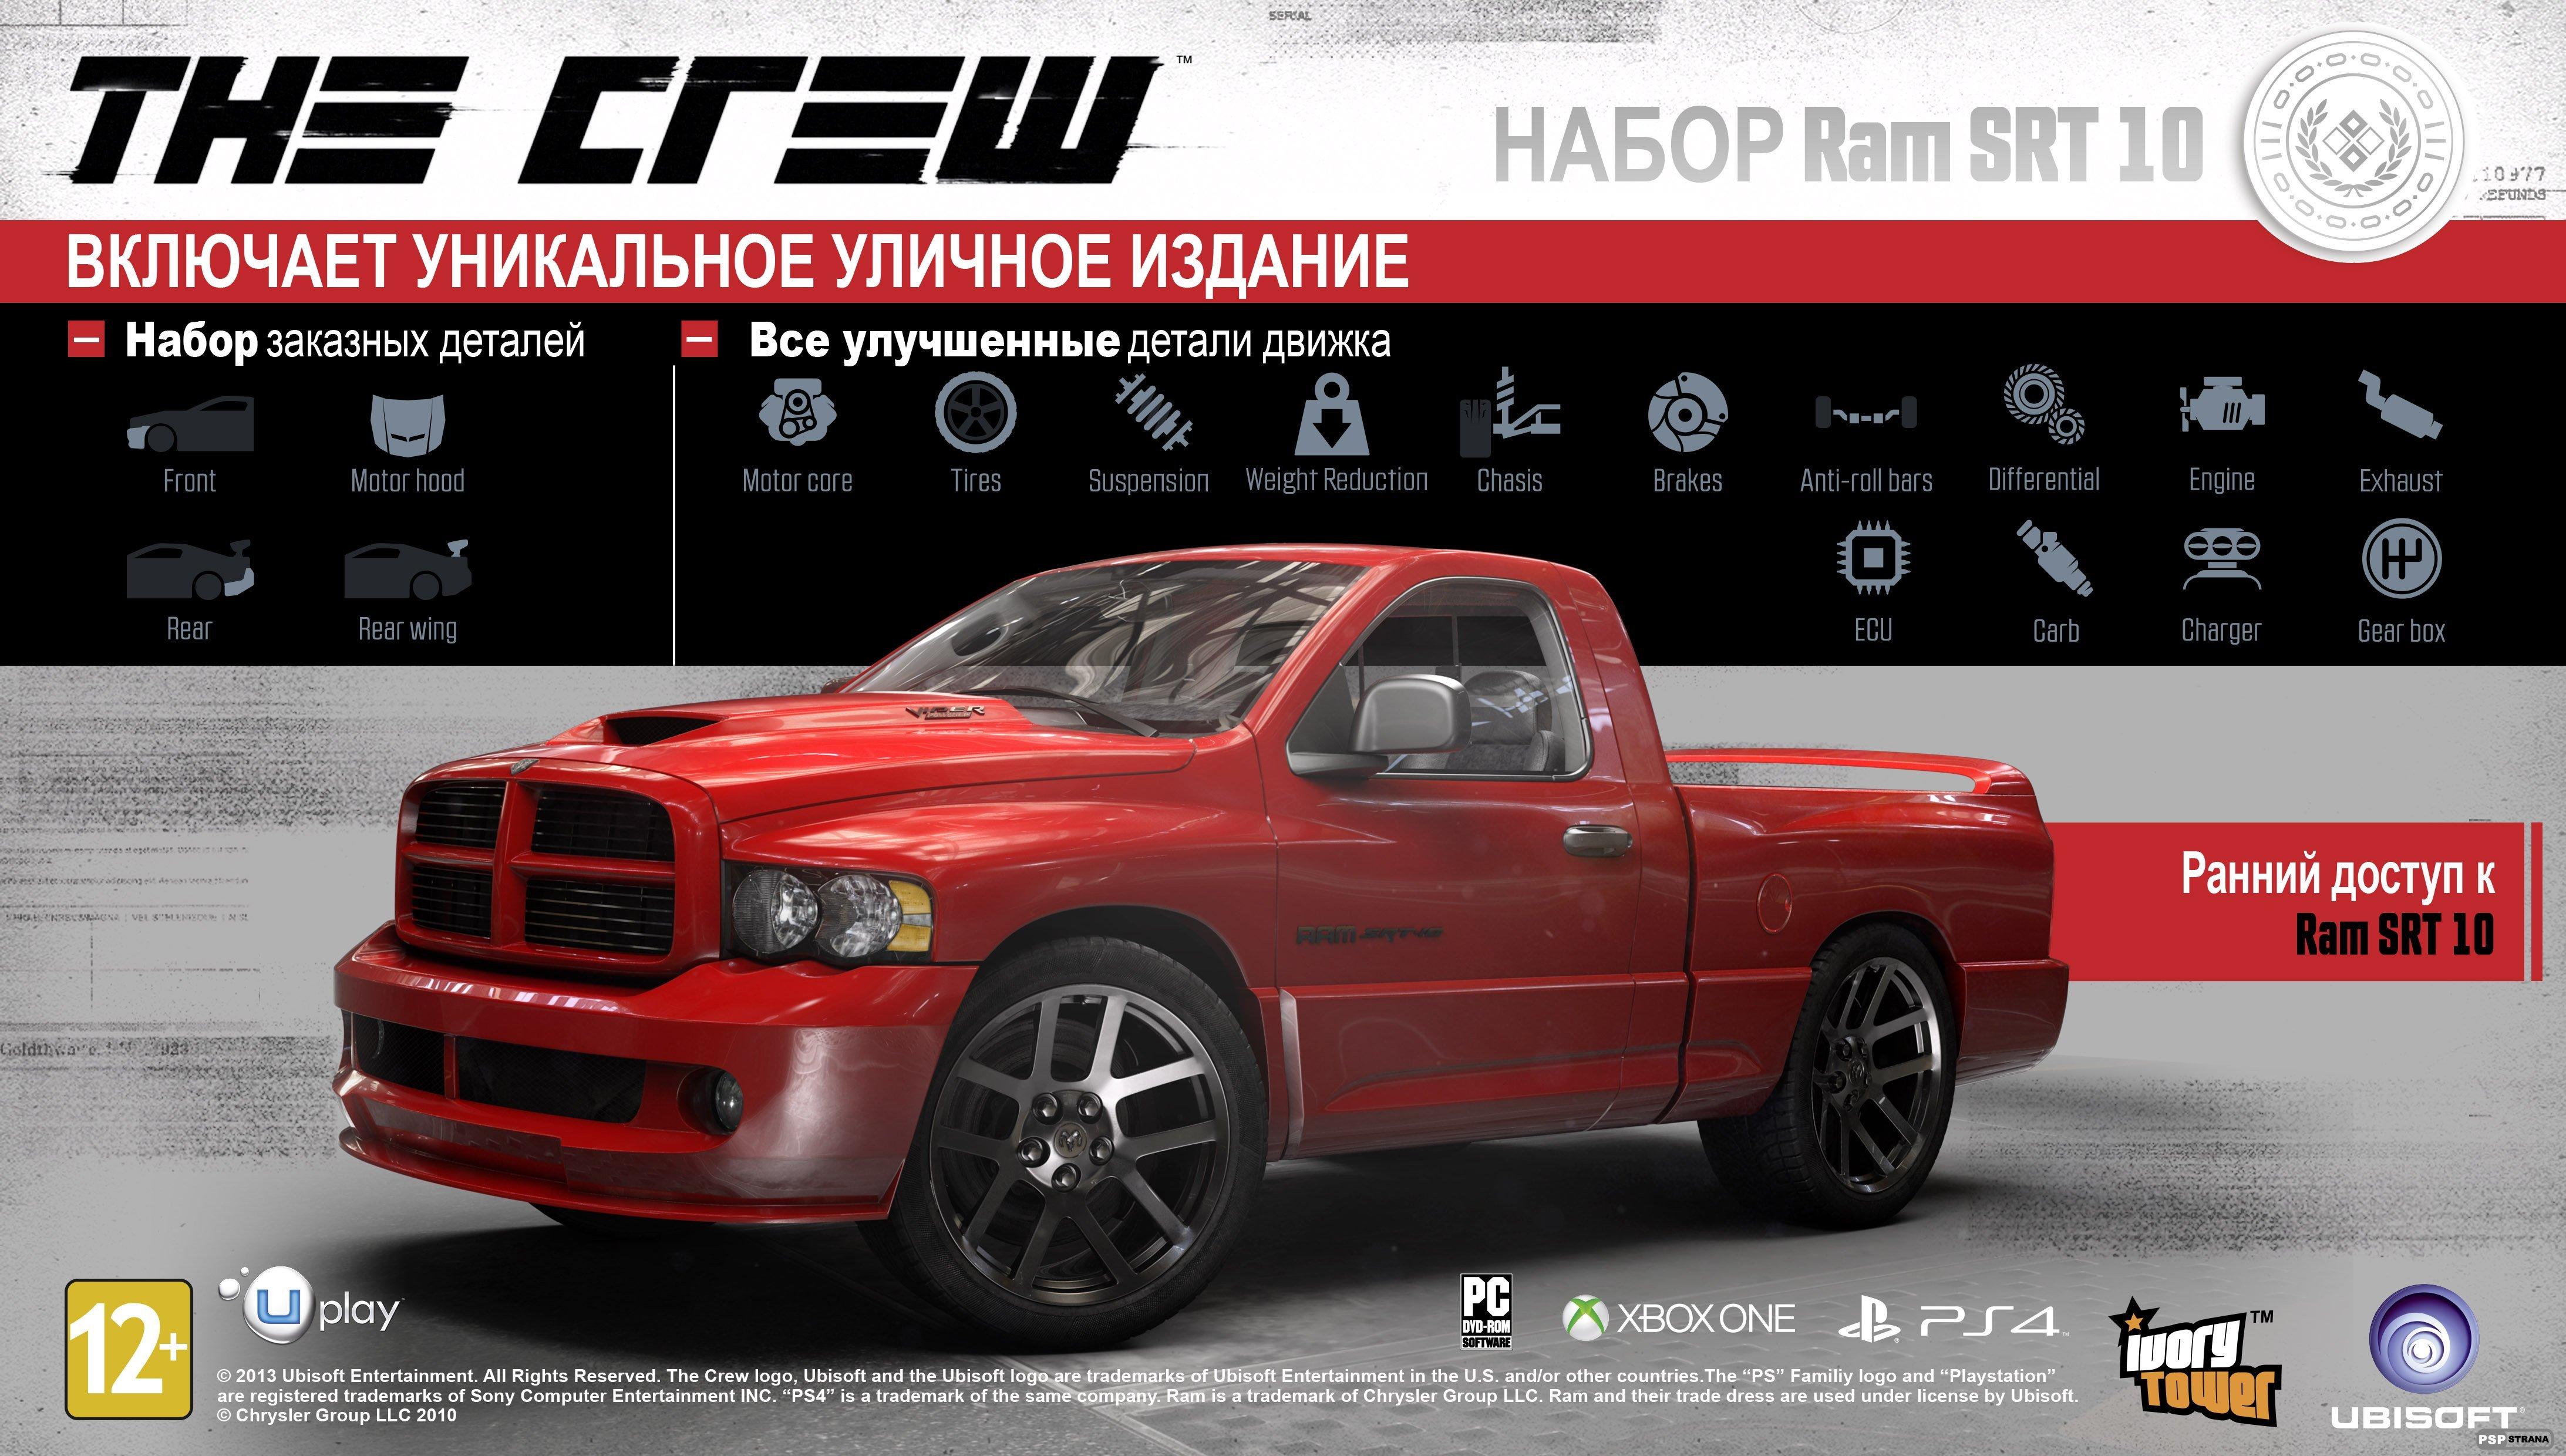 http://pspstrana.org/uploads/posts/2014-12/PSPstrana.ru_dlc_dodge_rus.jpg.jpg